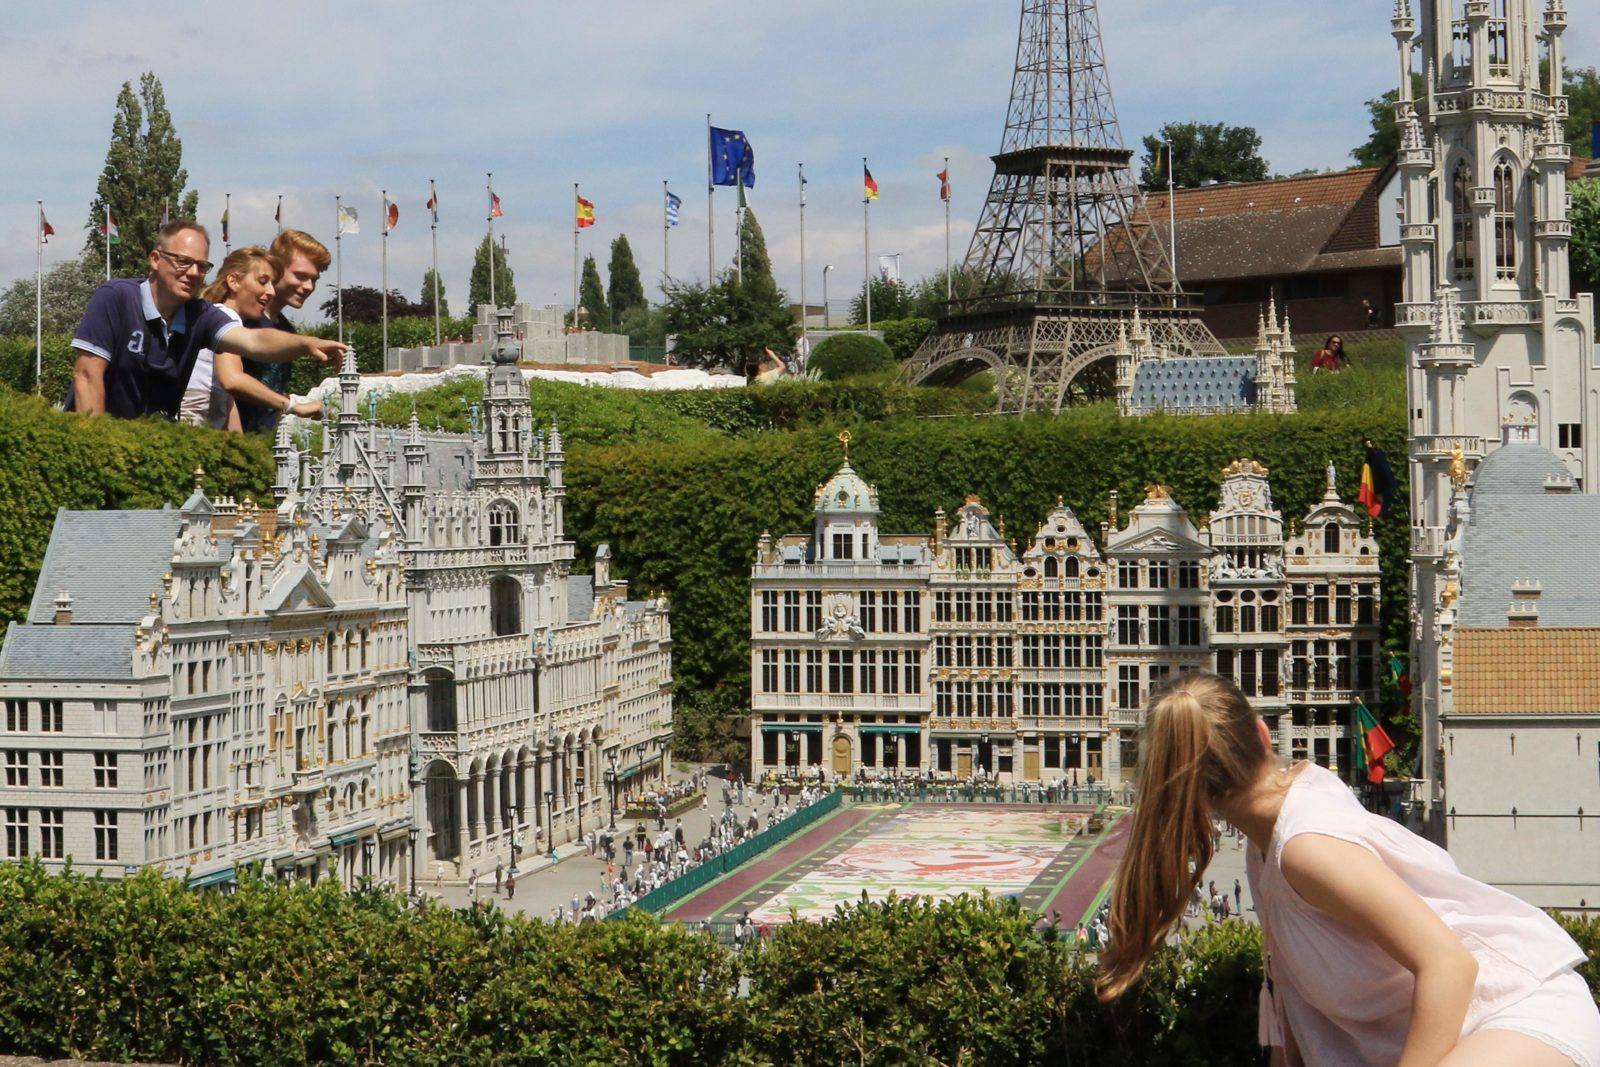 The President Brussels Hotel - Mini Europe